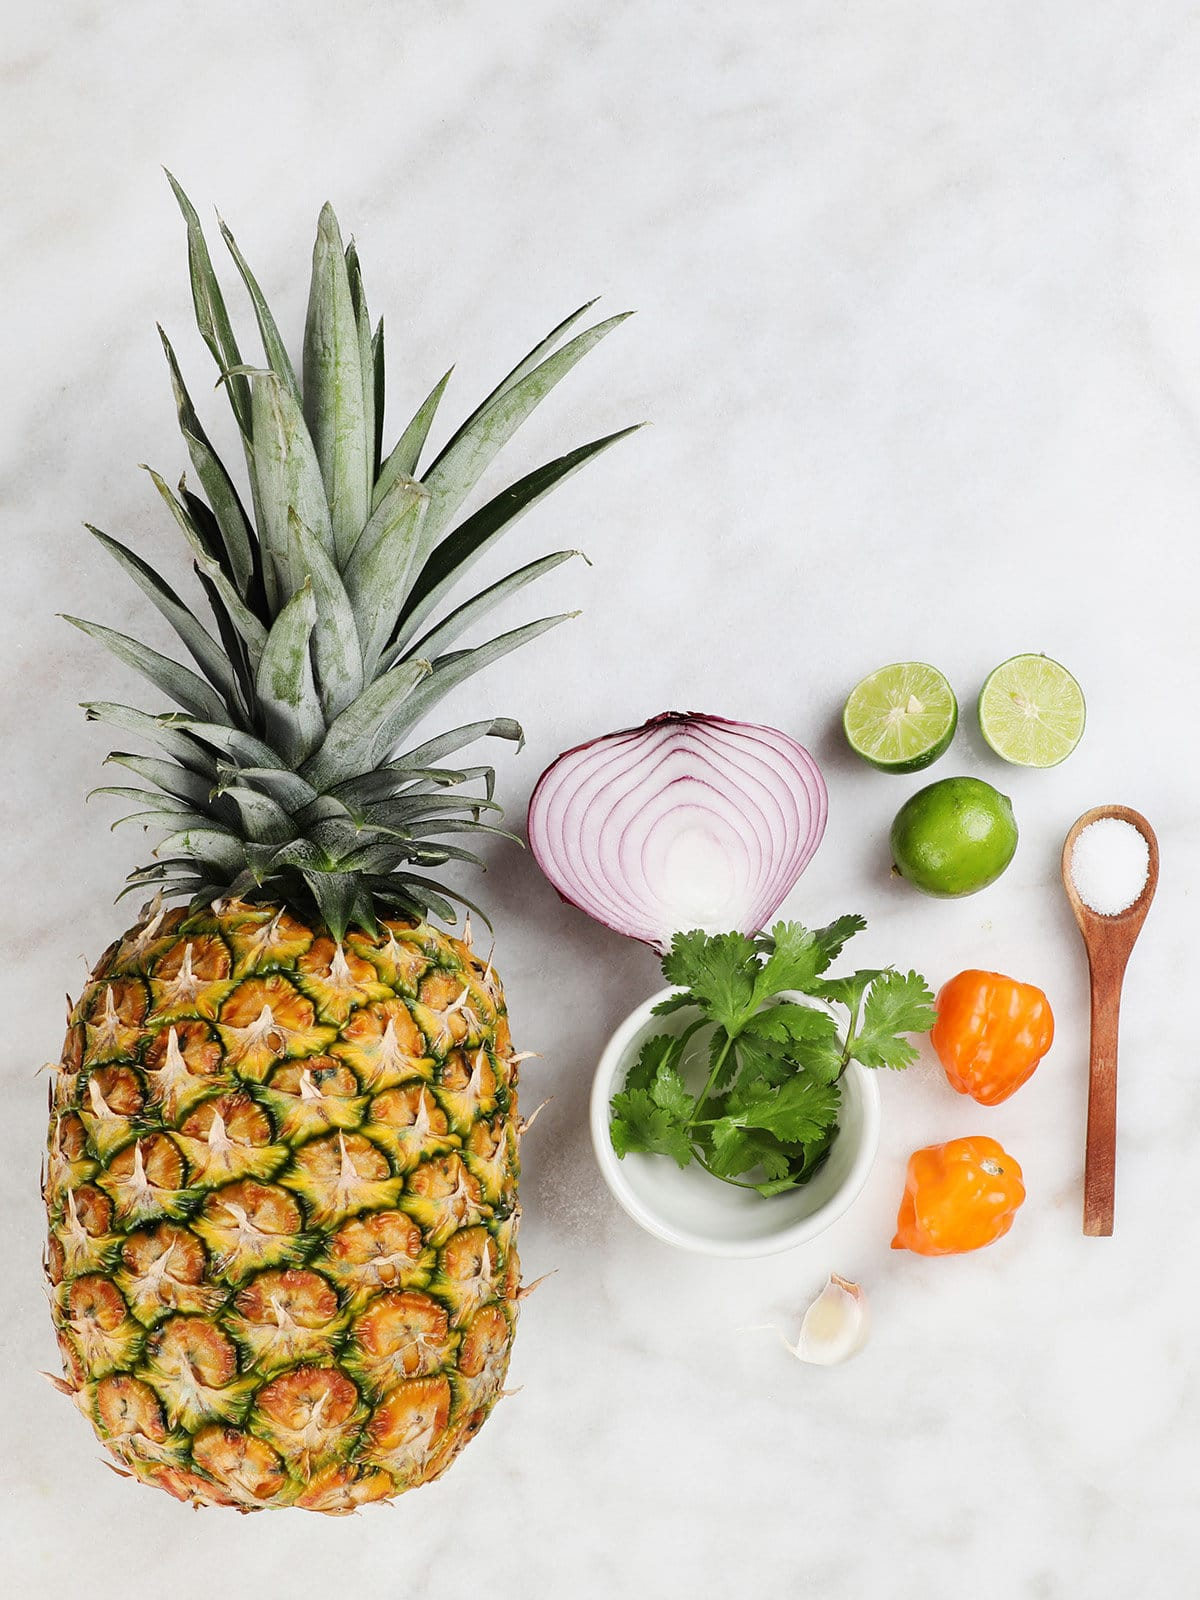 Pineapple Habanero Salsa Ingredients